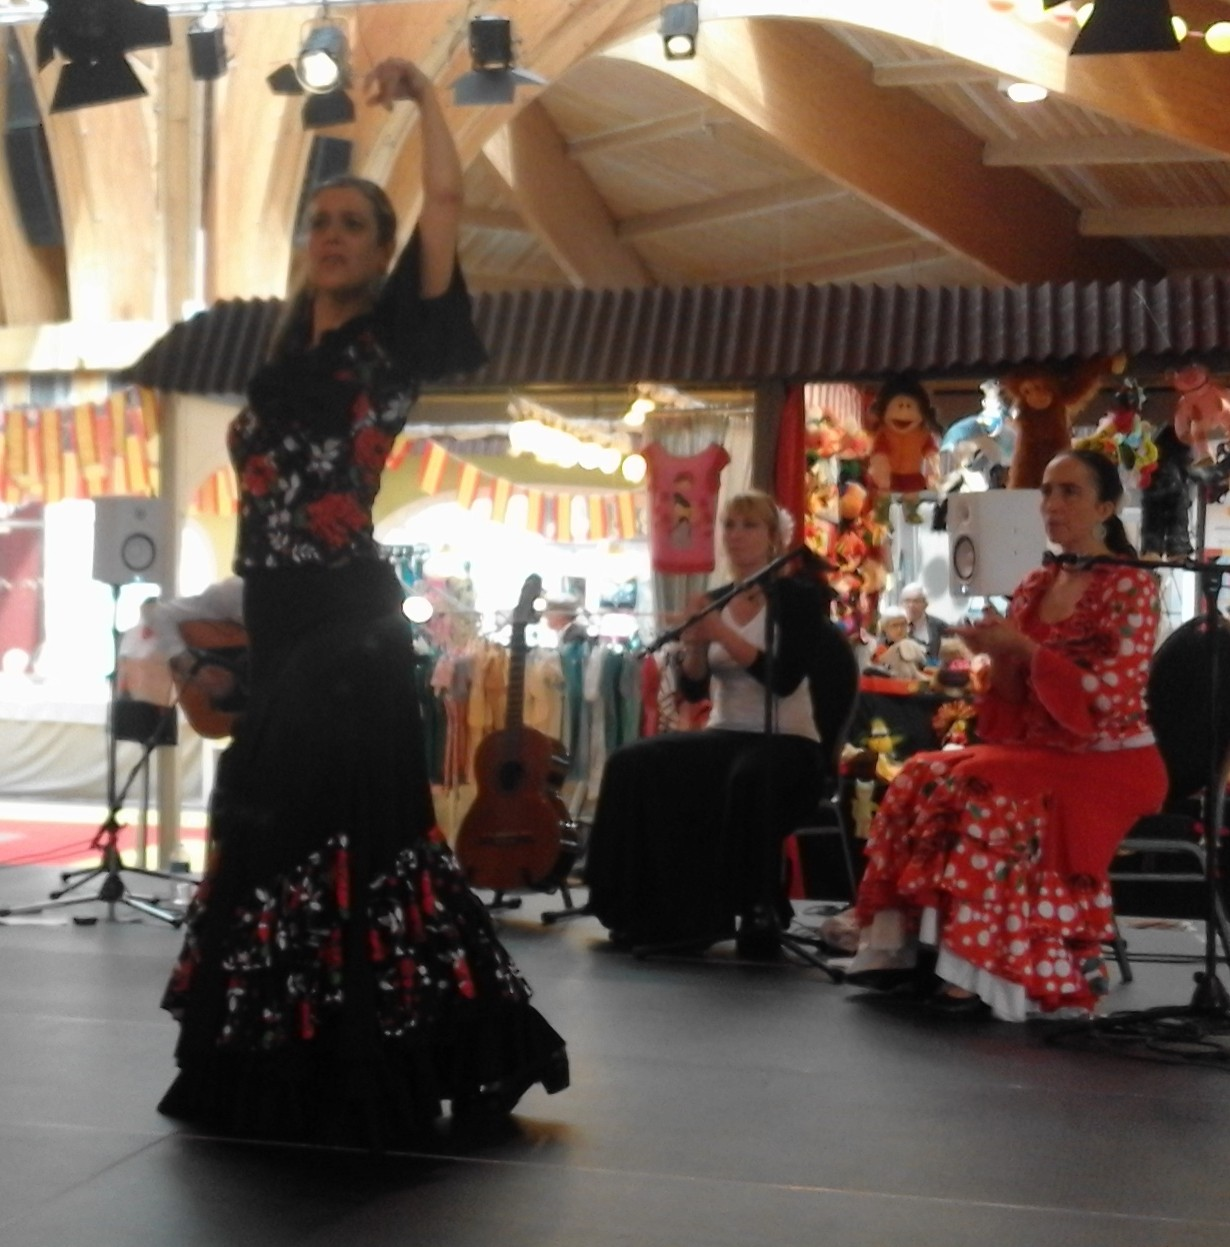 Duende flamenco flamencura a la foire comtoise mai 2019 solea a mathieu fuster 4